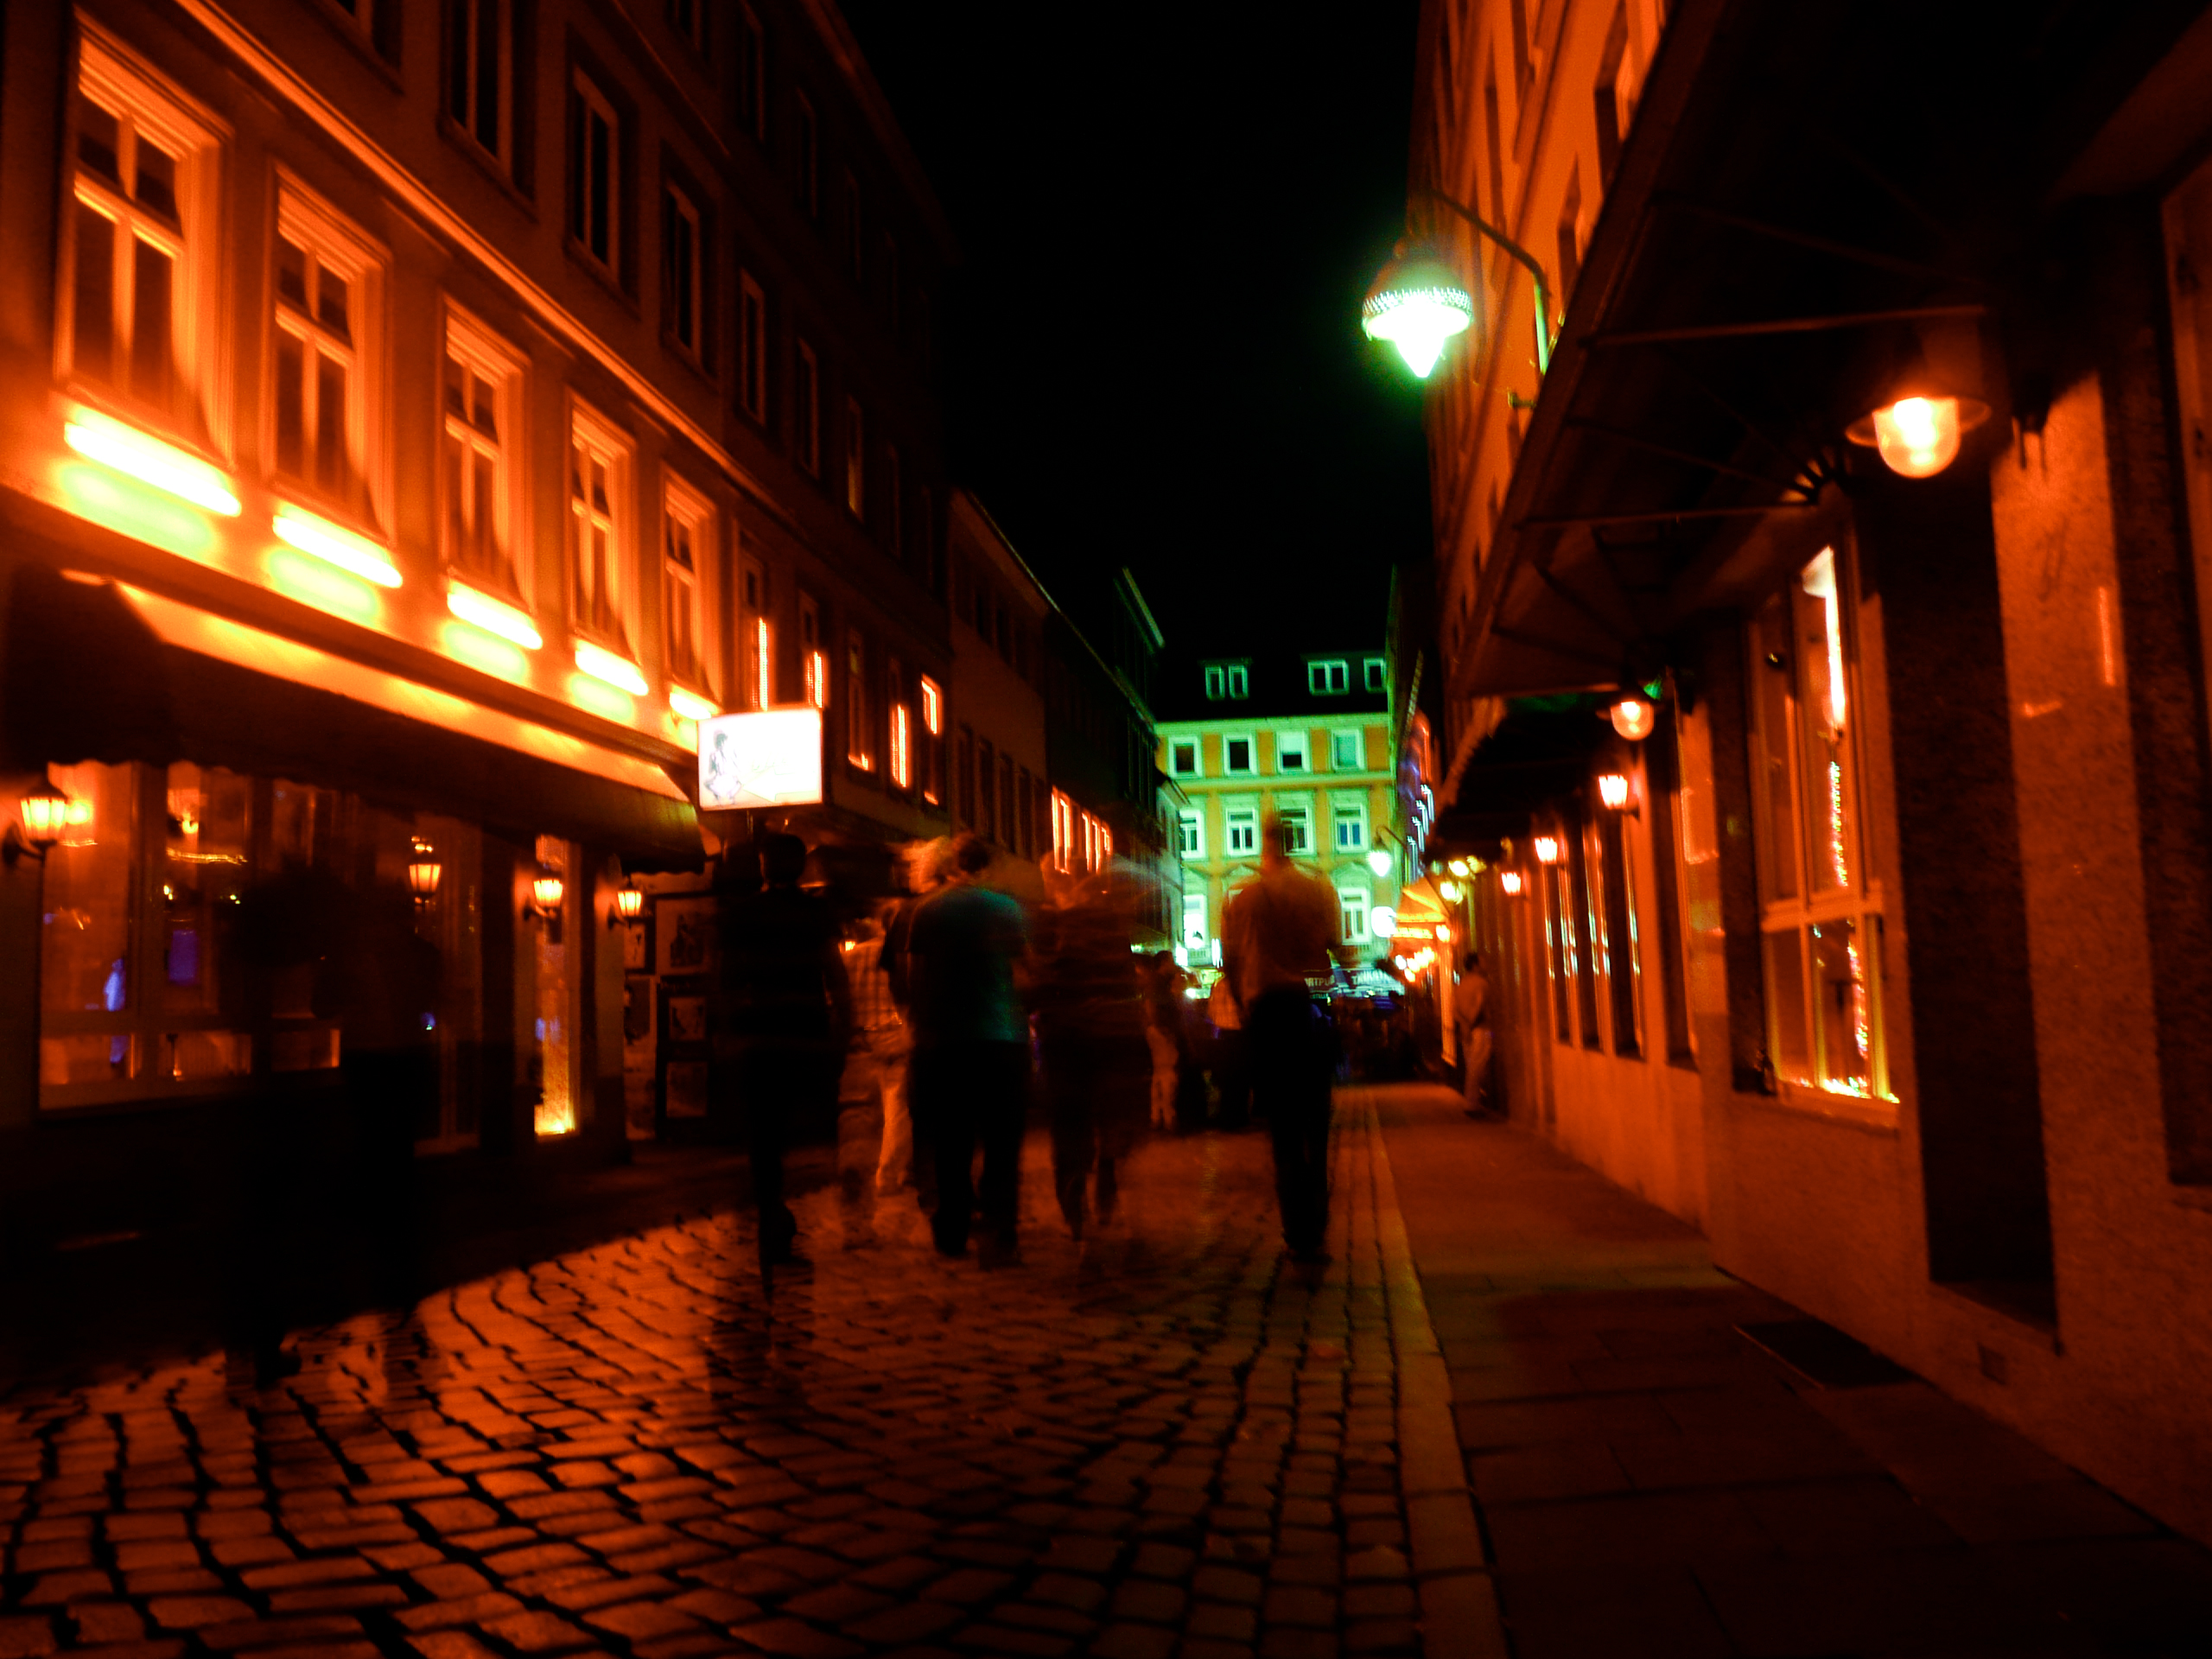 prostituierte antoniusstraße aachen private prostituierte karlsruhe